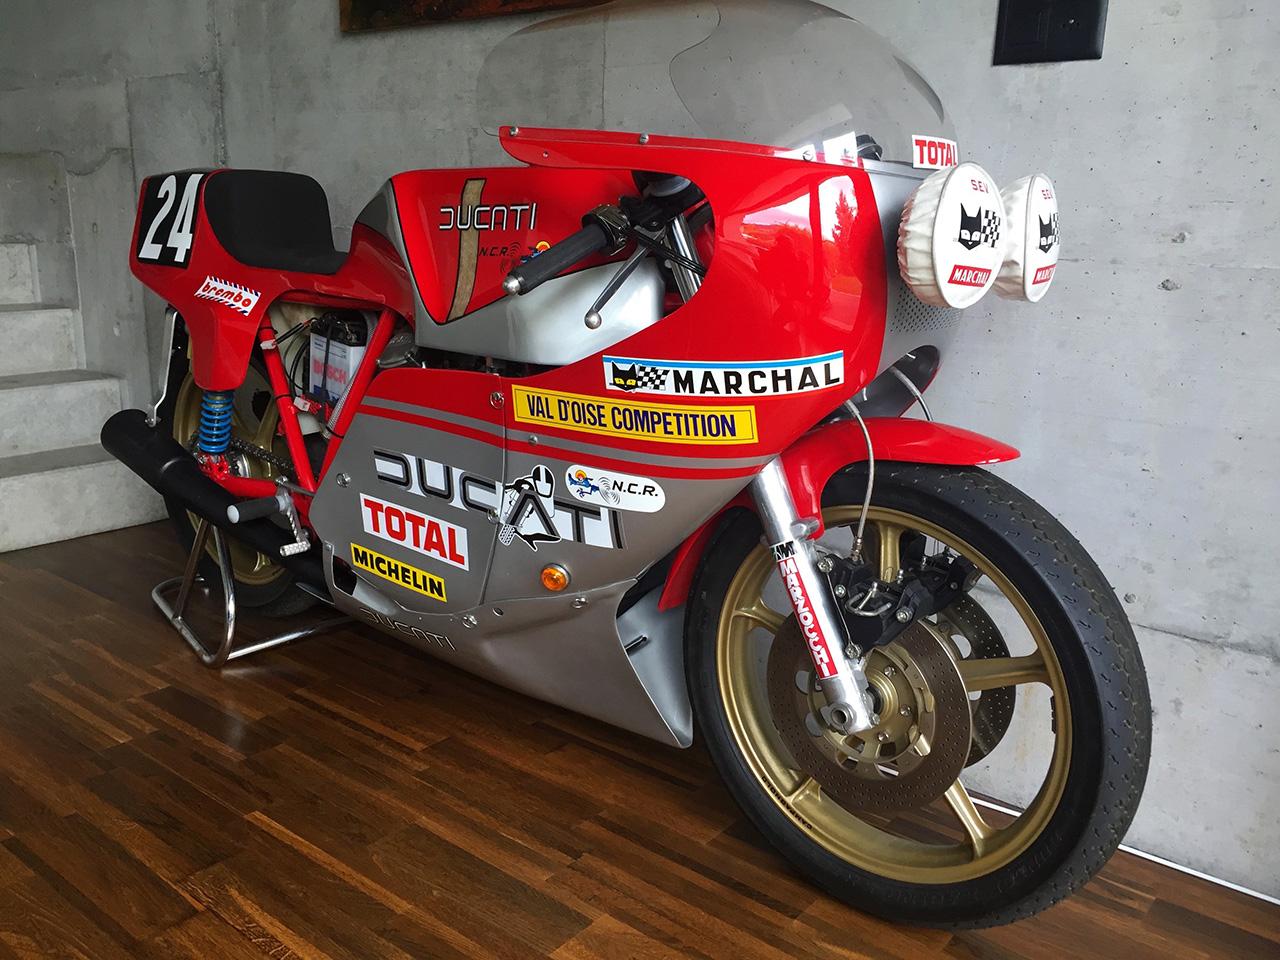 Ducati Sonderausstellung